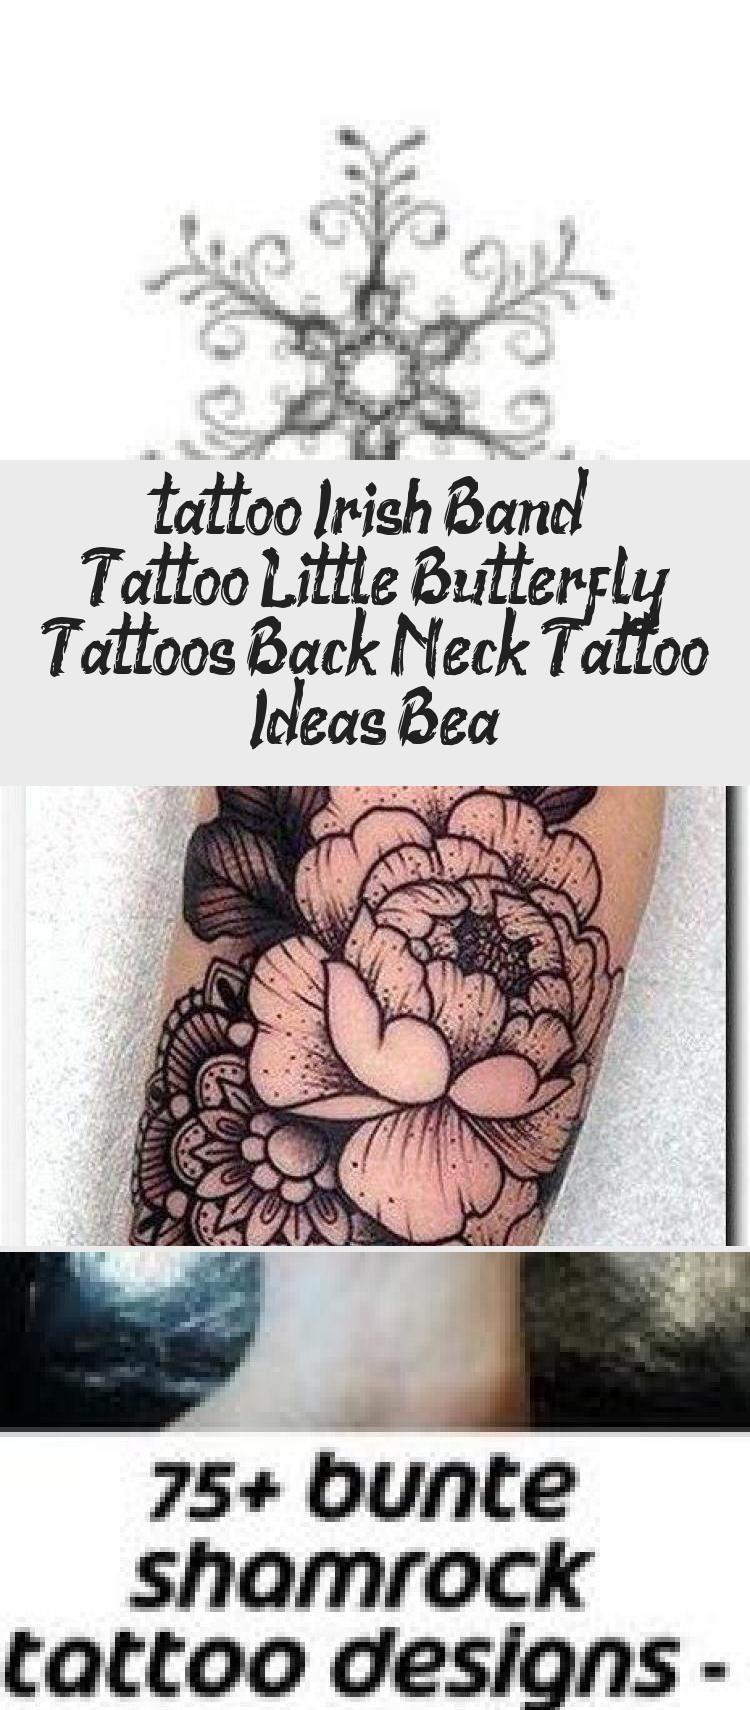 Photo of #tattoo Irish Band Tattoo, Little Butterfly Tattoos, Back Neck Tattoo Ideas, Bea… – Tattoos and Body Art